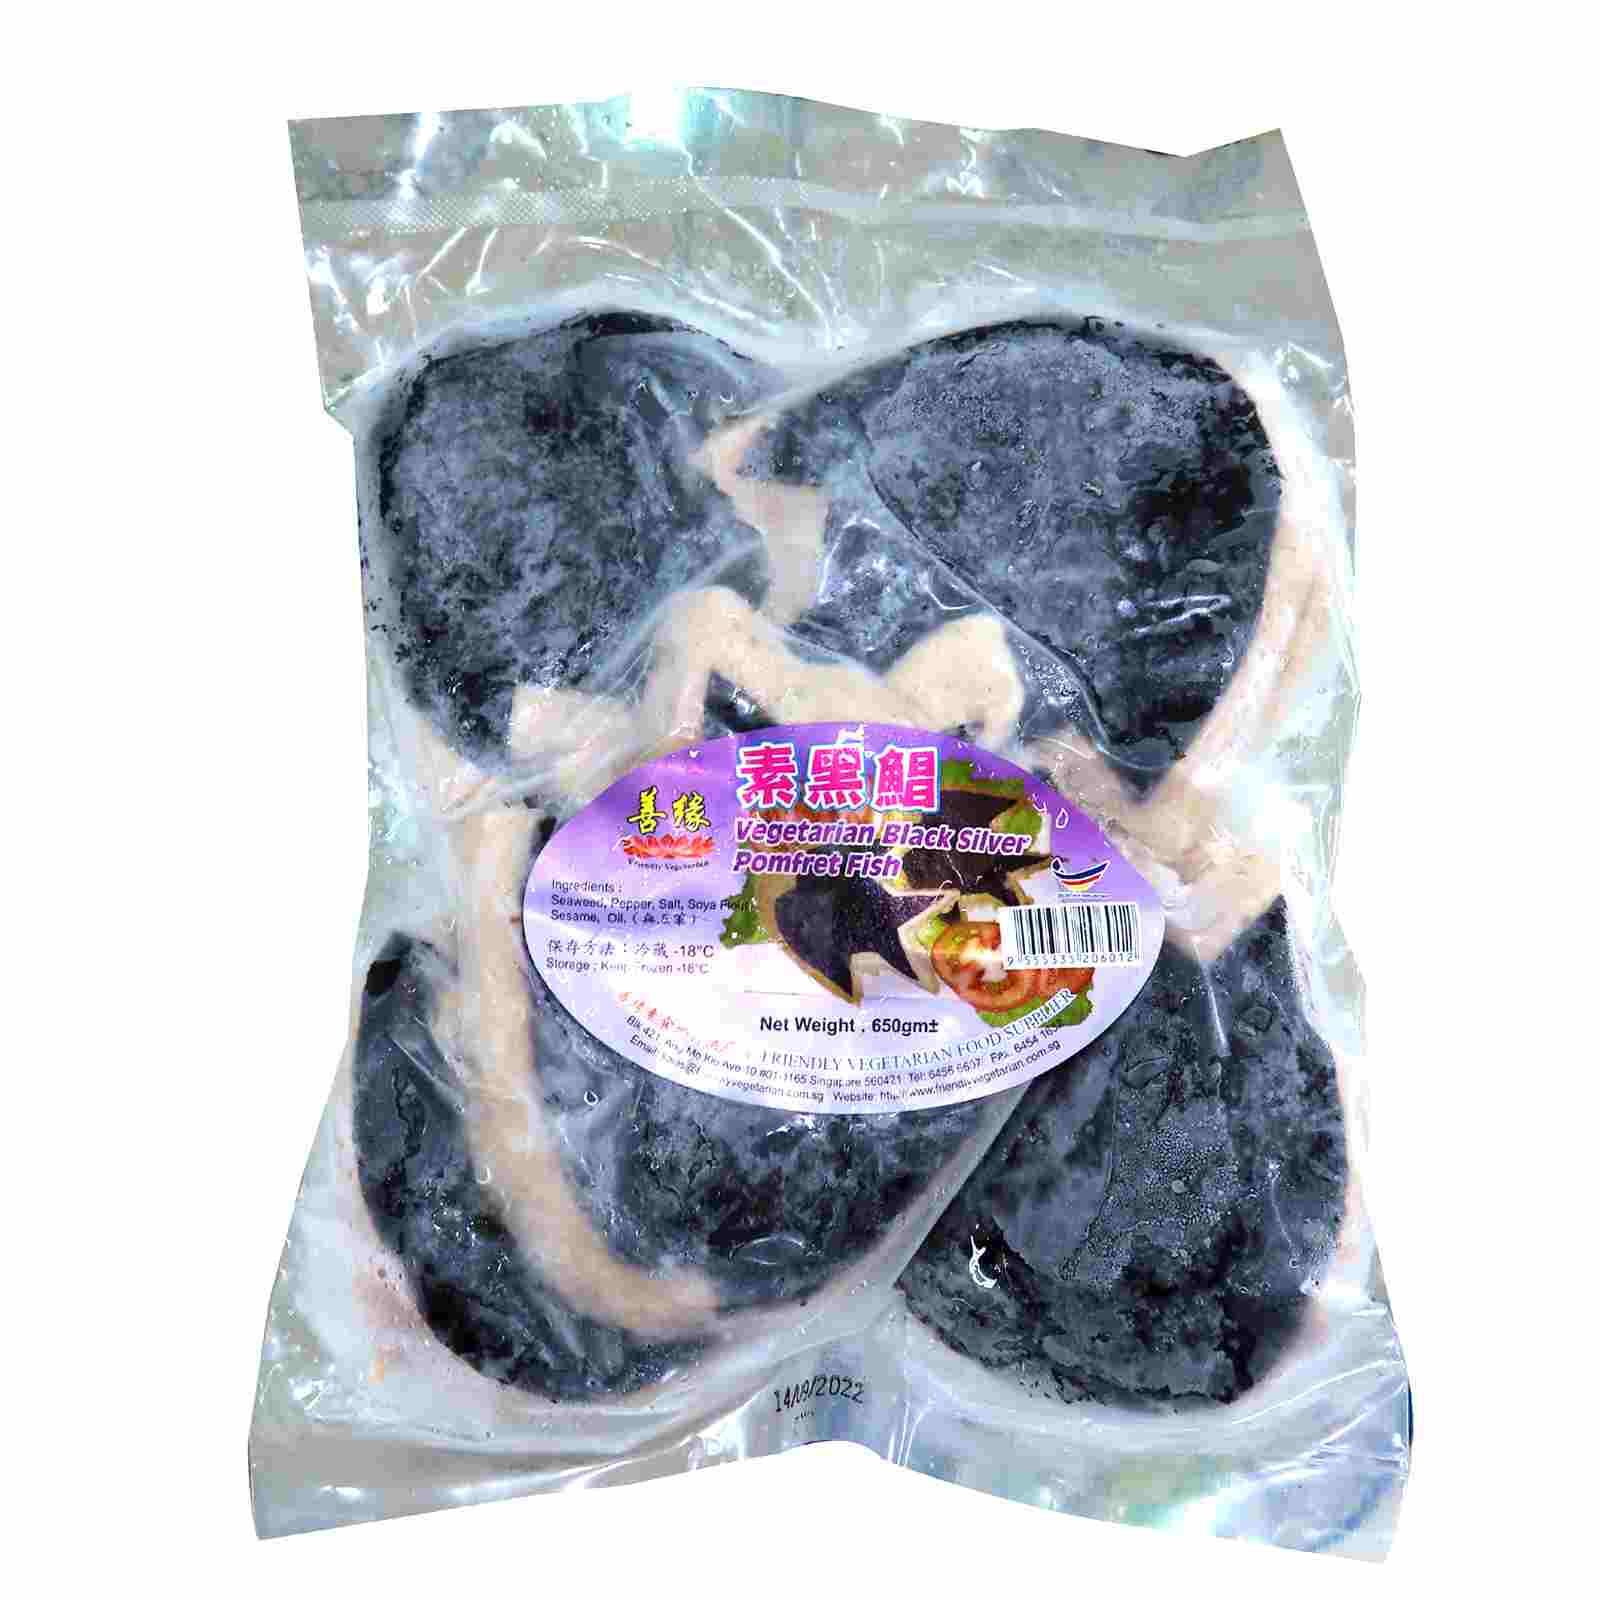 Image Vegetarian Black Silver Pomfret Fish 善缘-素小黑鲳 650grams